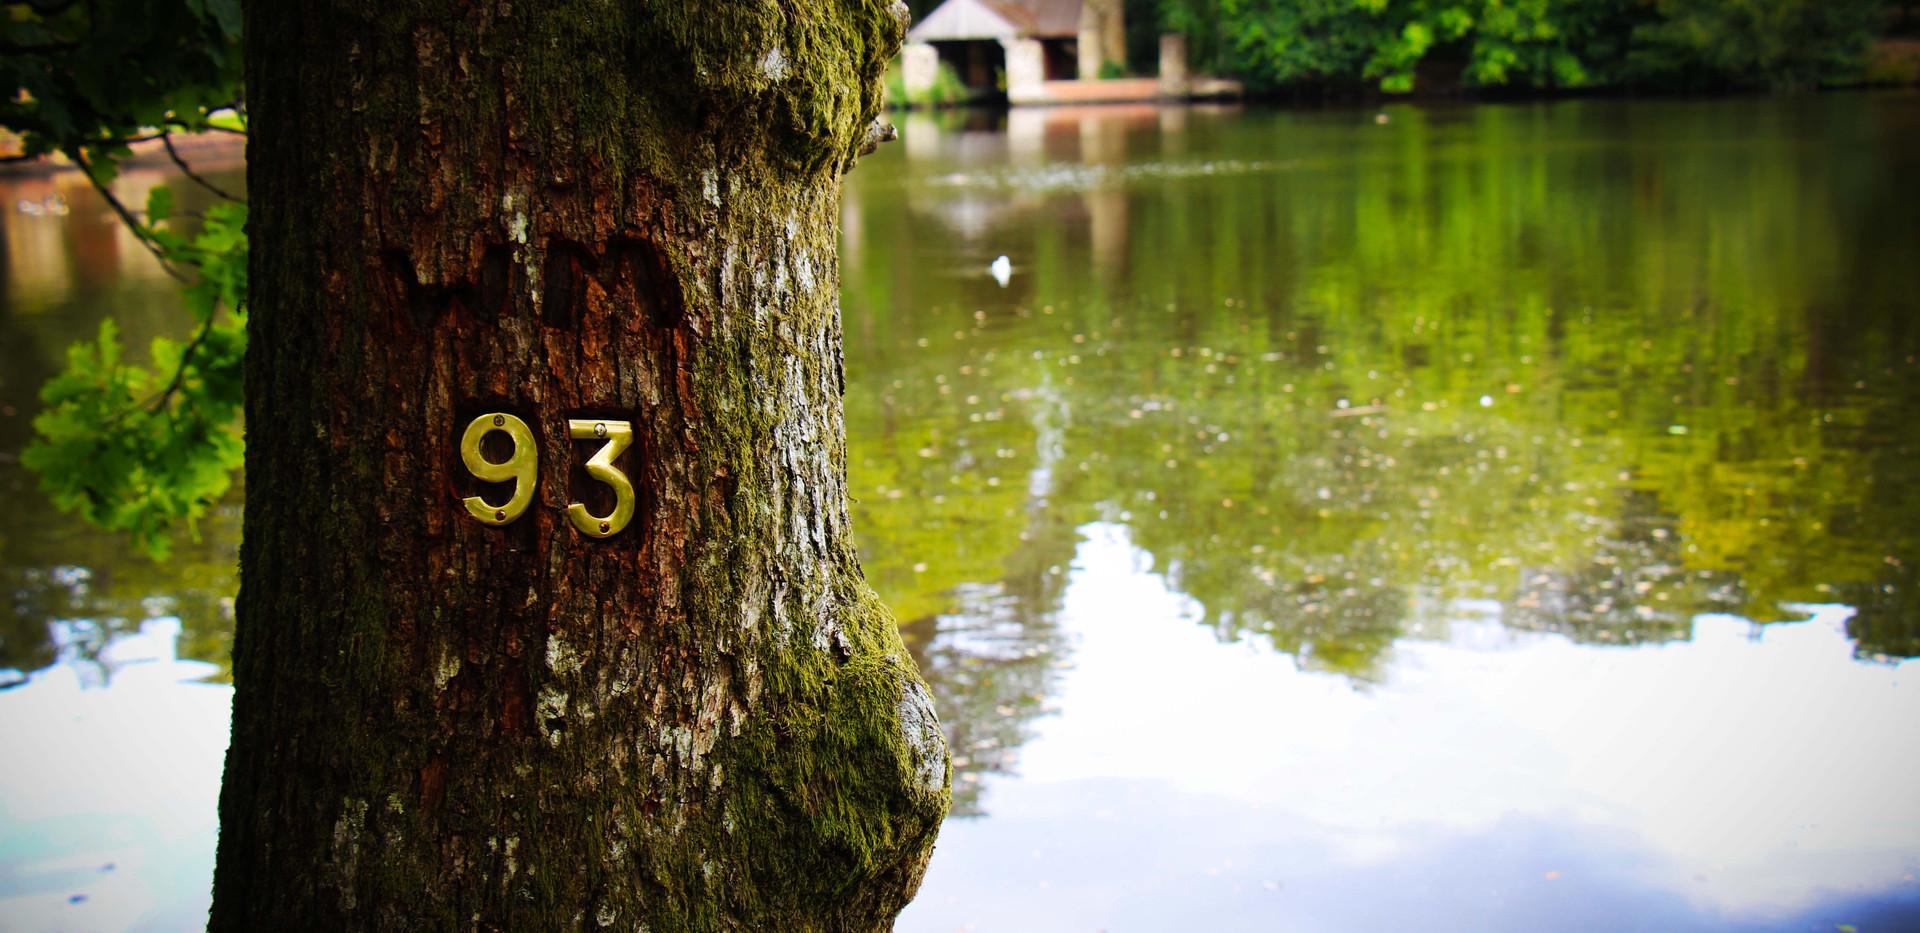 tree93